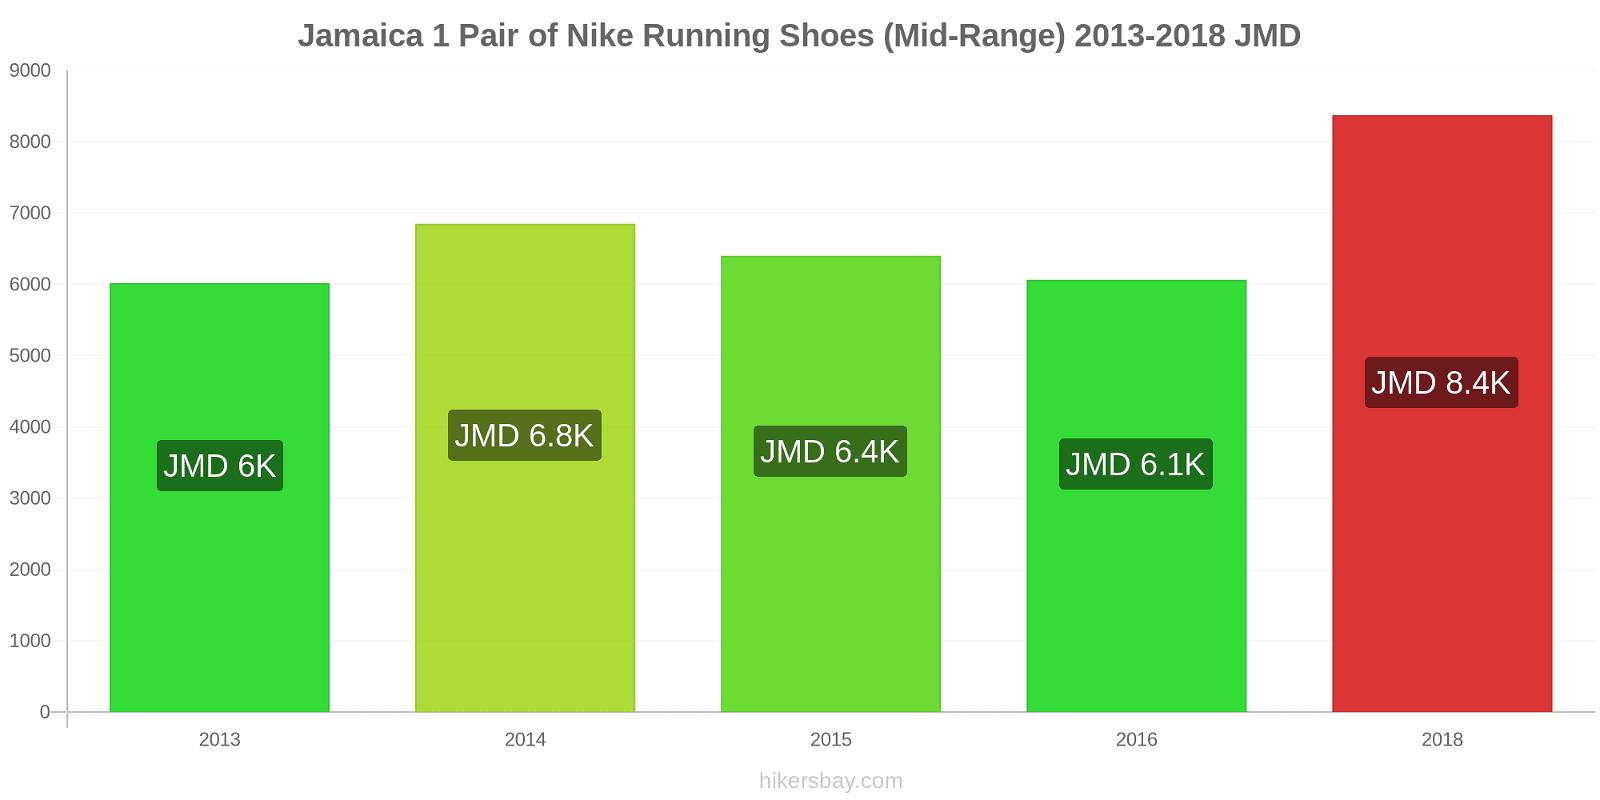 Jamaica price changes 1 Pair of Nike Running Shoes (Mid-Range) hikersbay.com